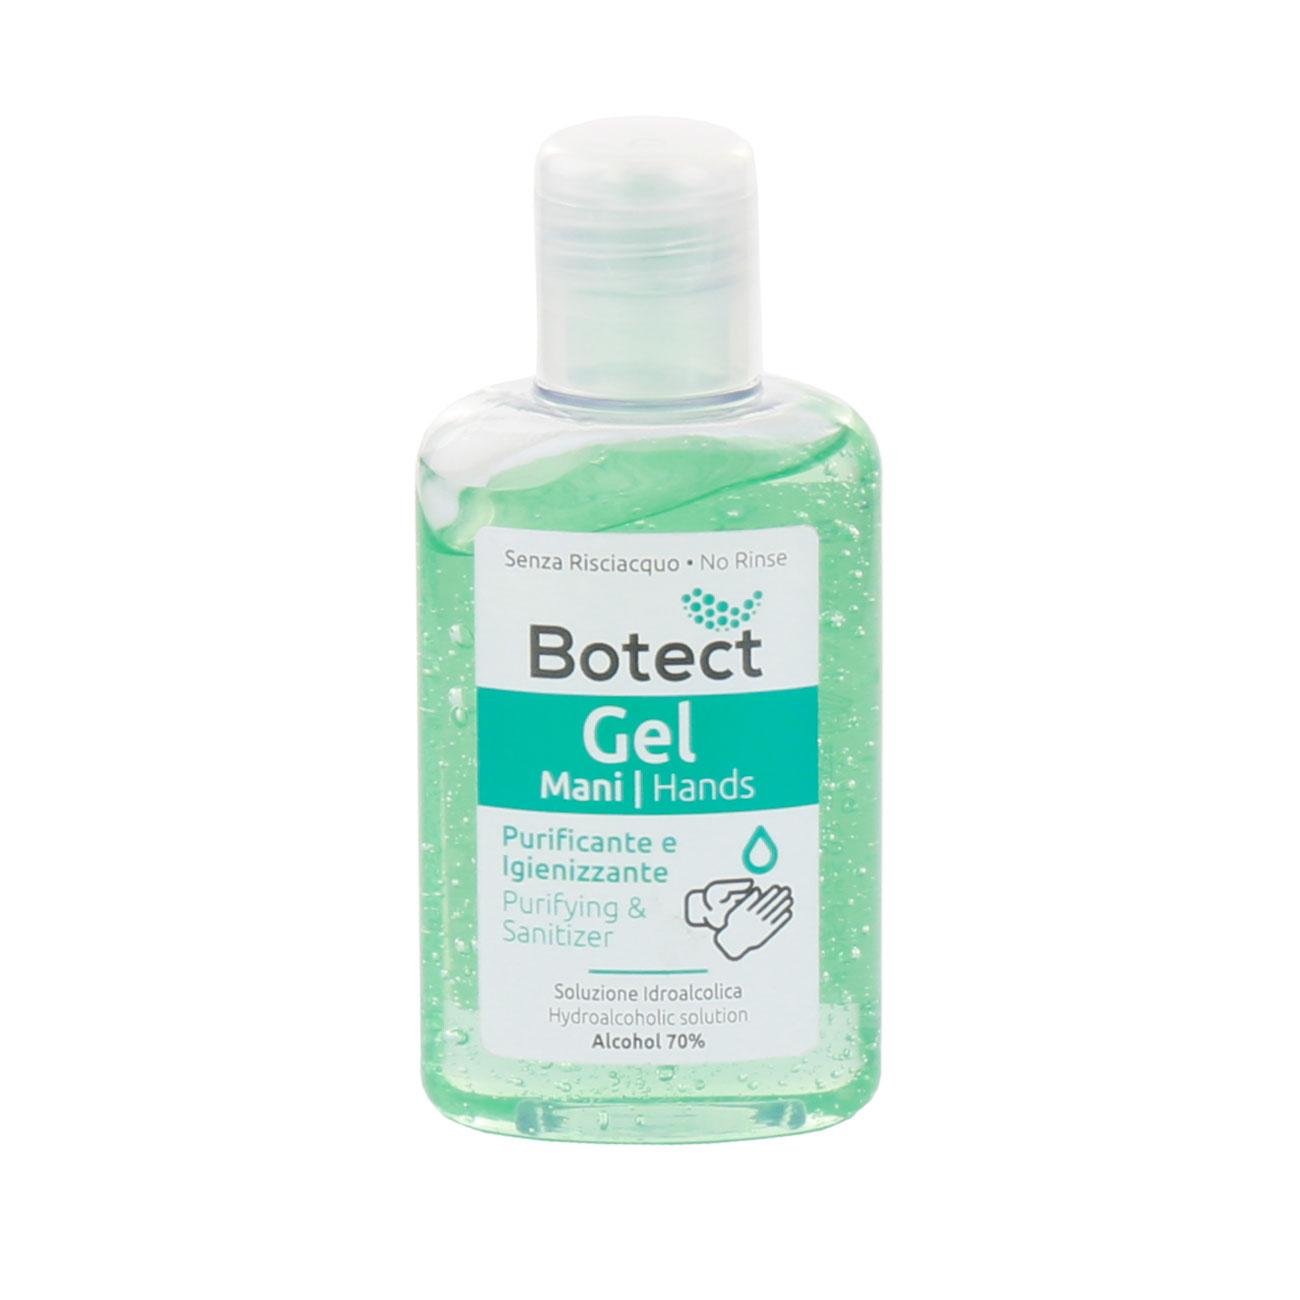 Gel-Igienizzante-Mani-Botect-Flacone-Fronte